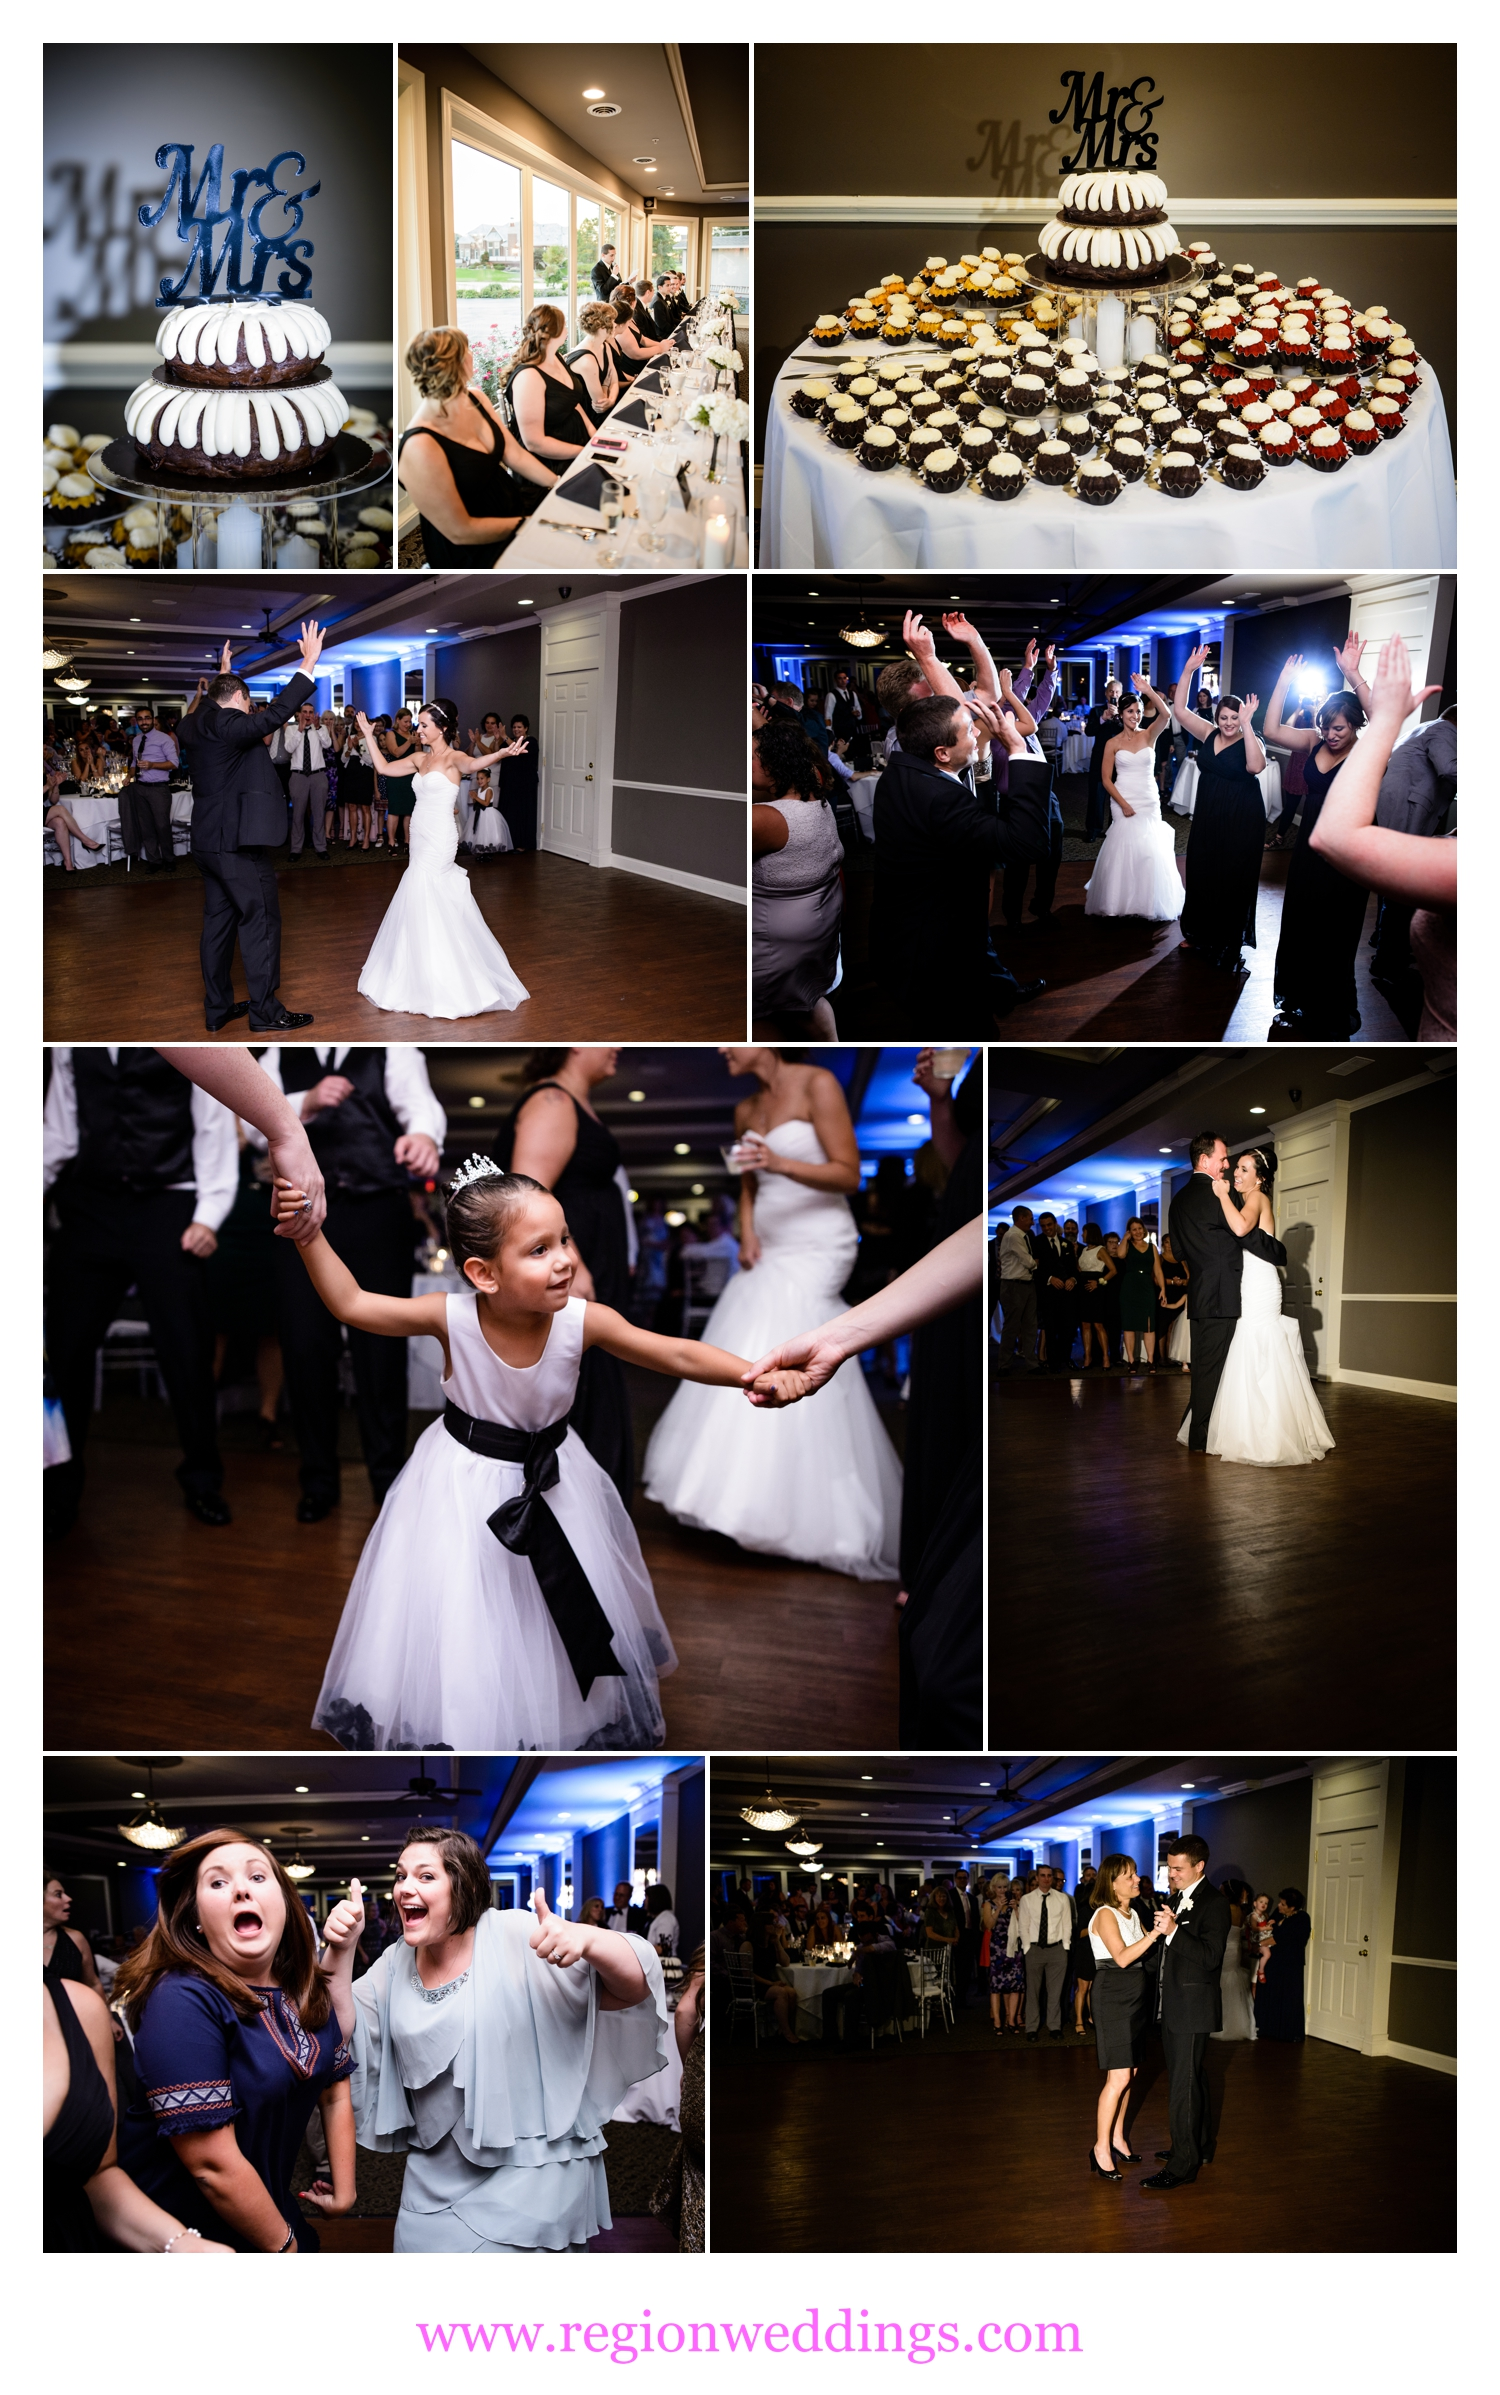 Wedding reception at White Hawk Country Club.